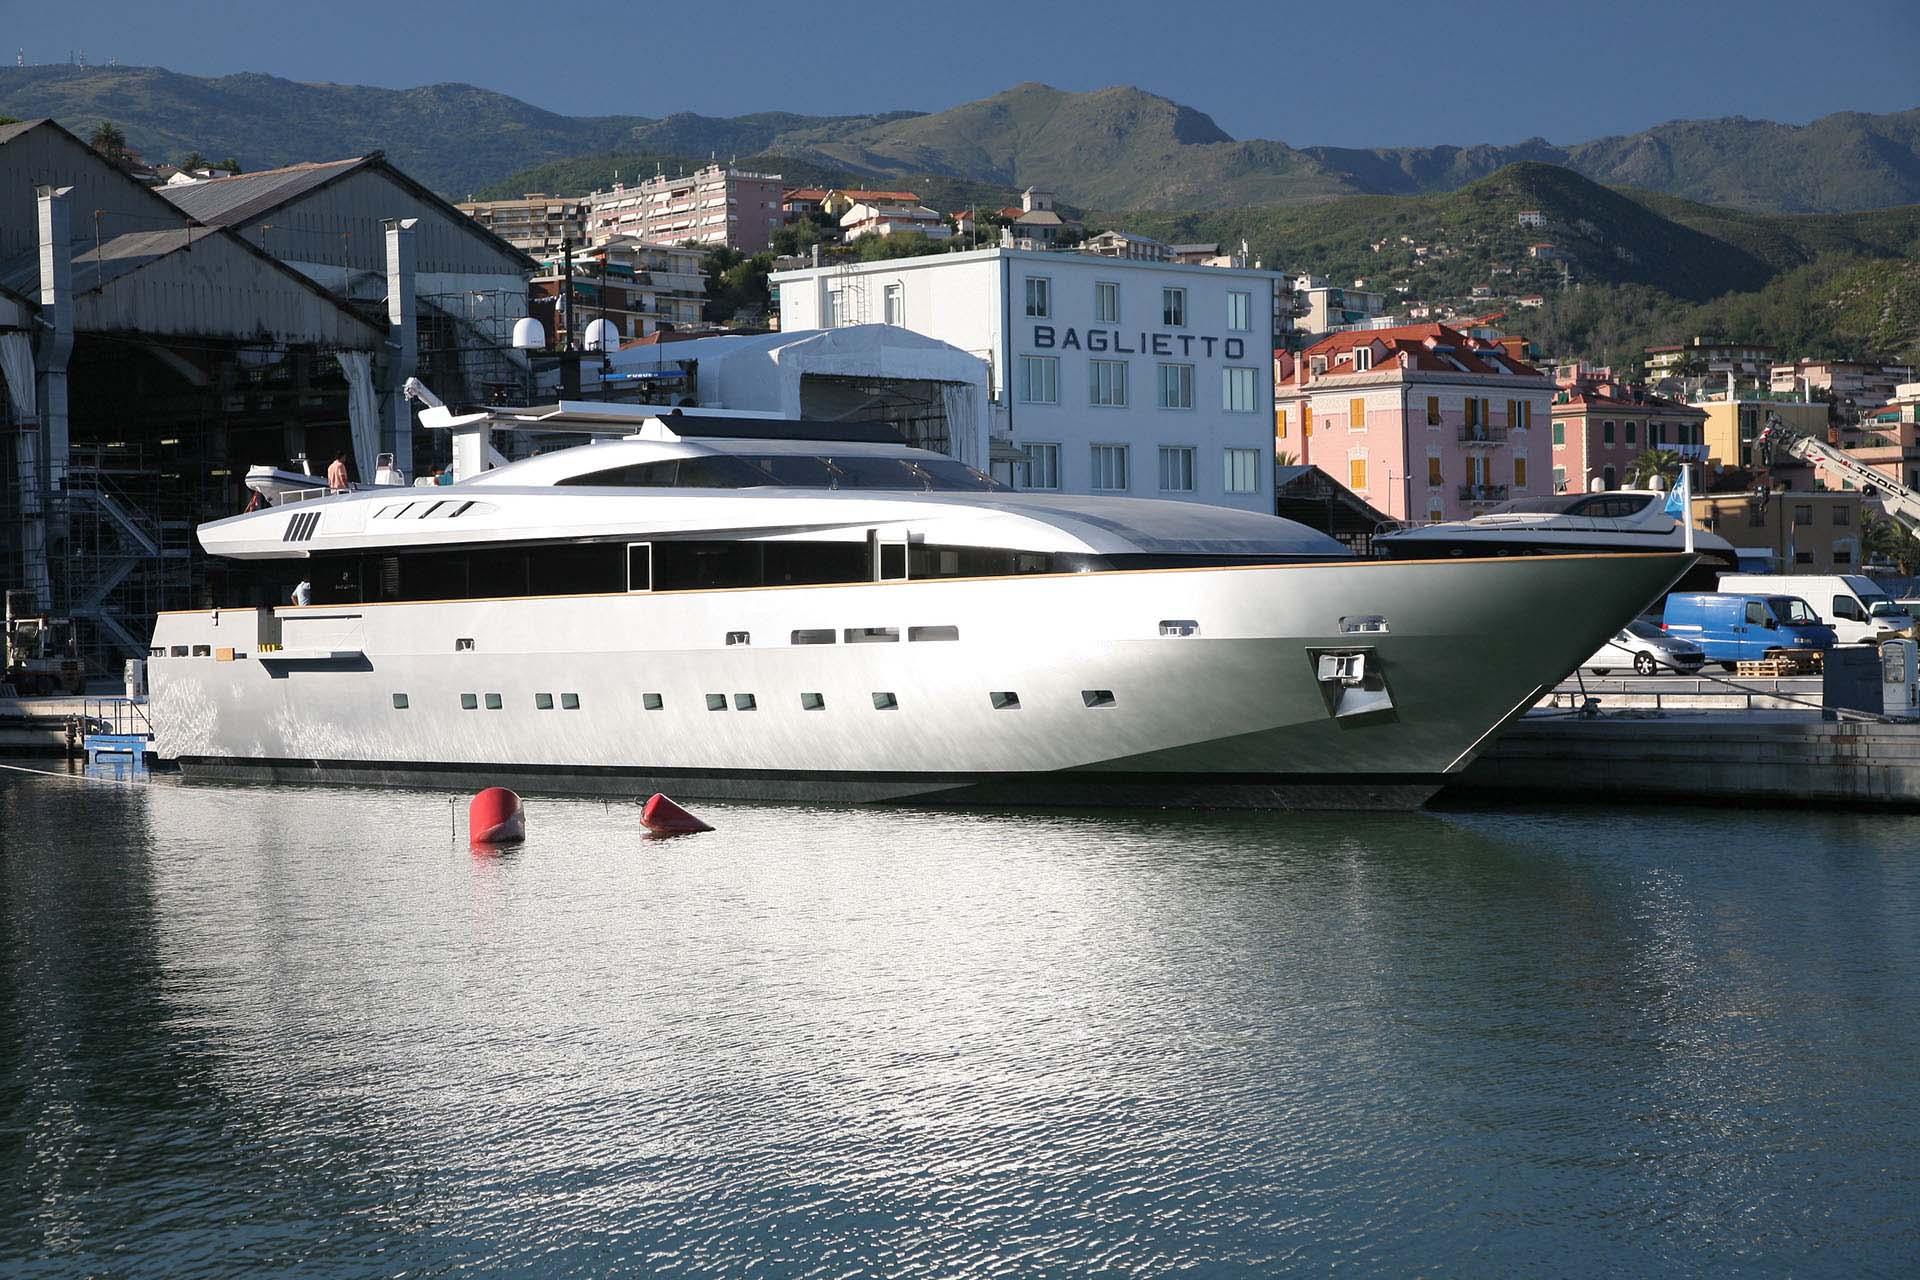 baglietto - TIN TIN - Paskowsky Yacht Design